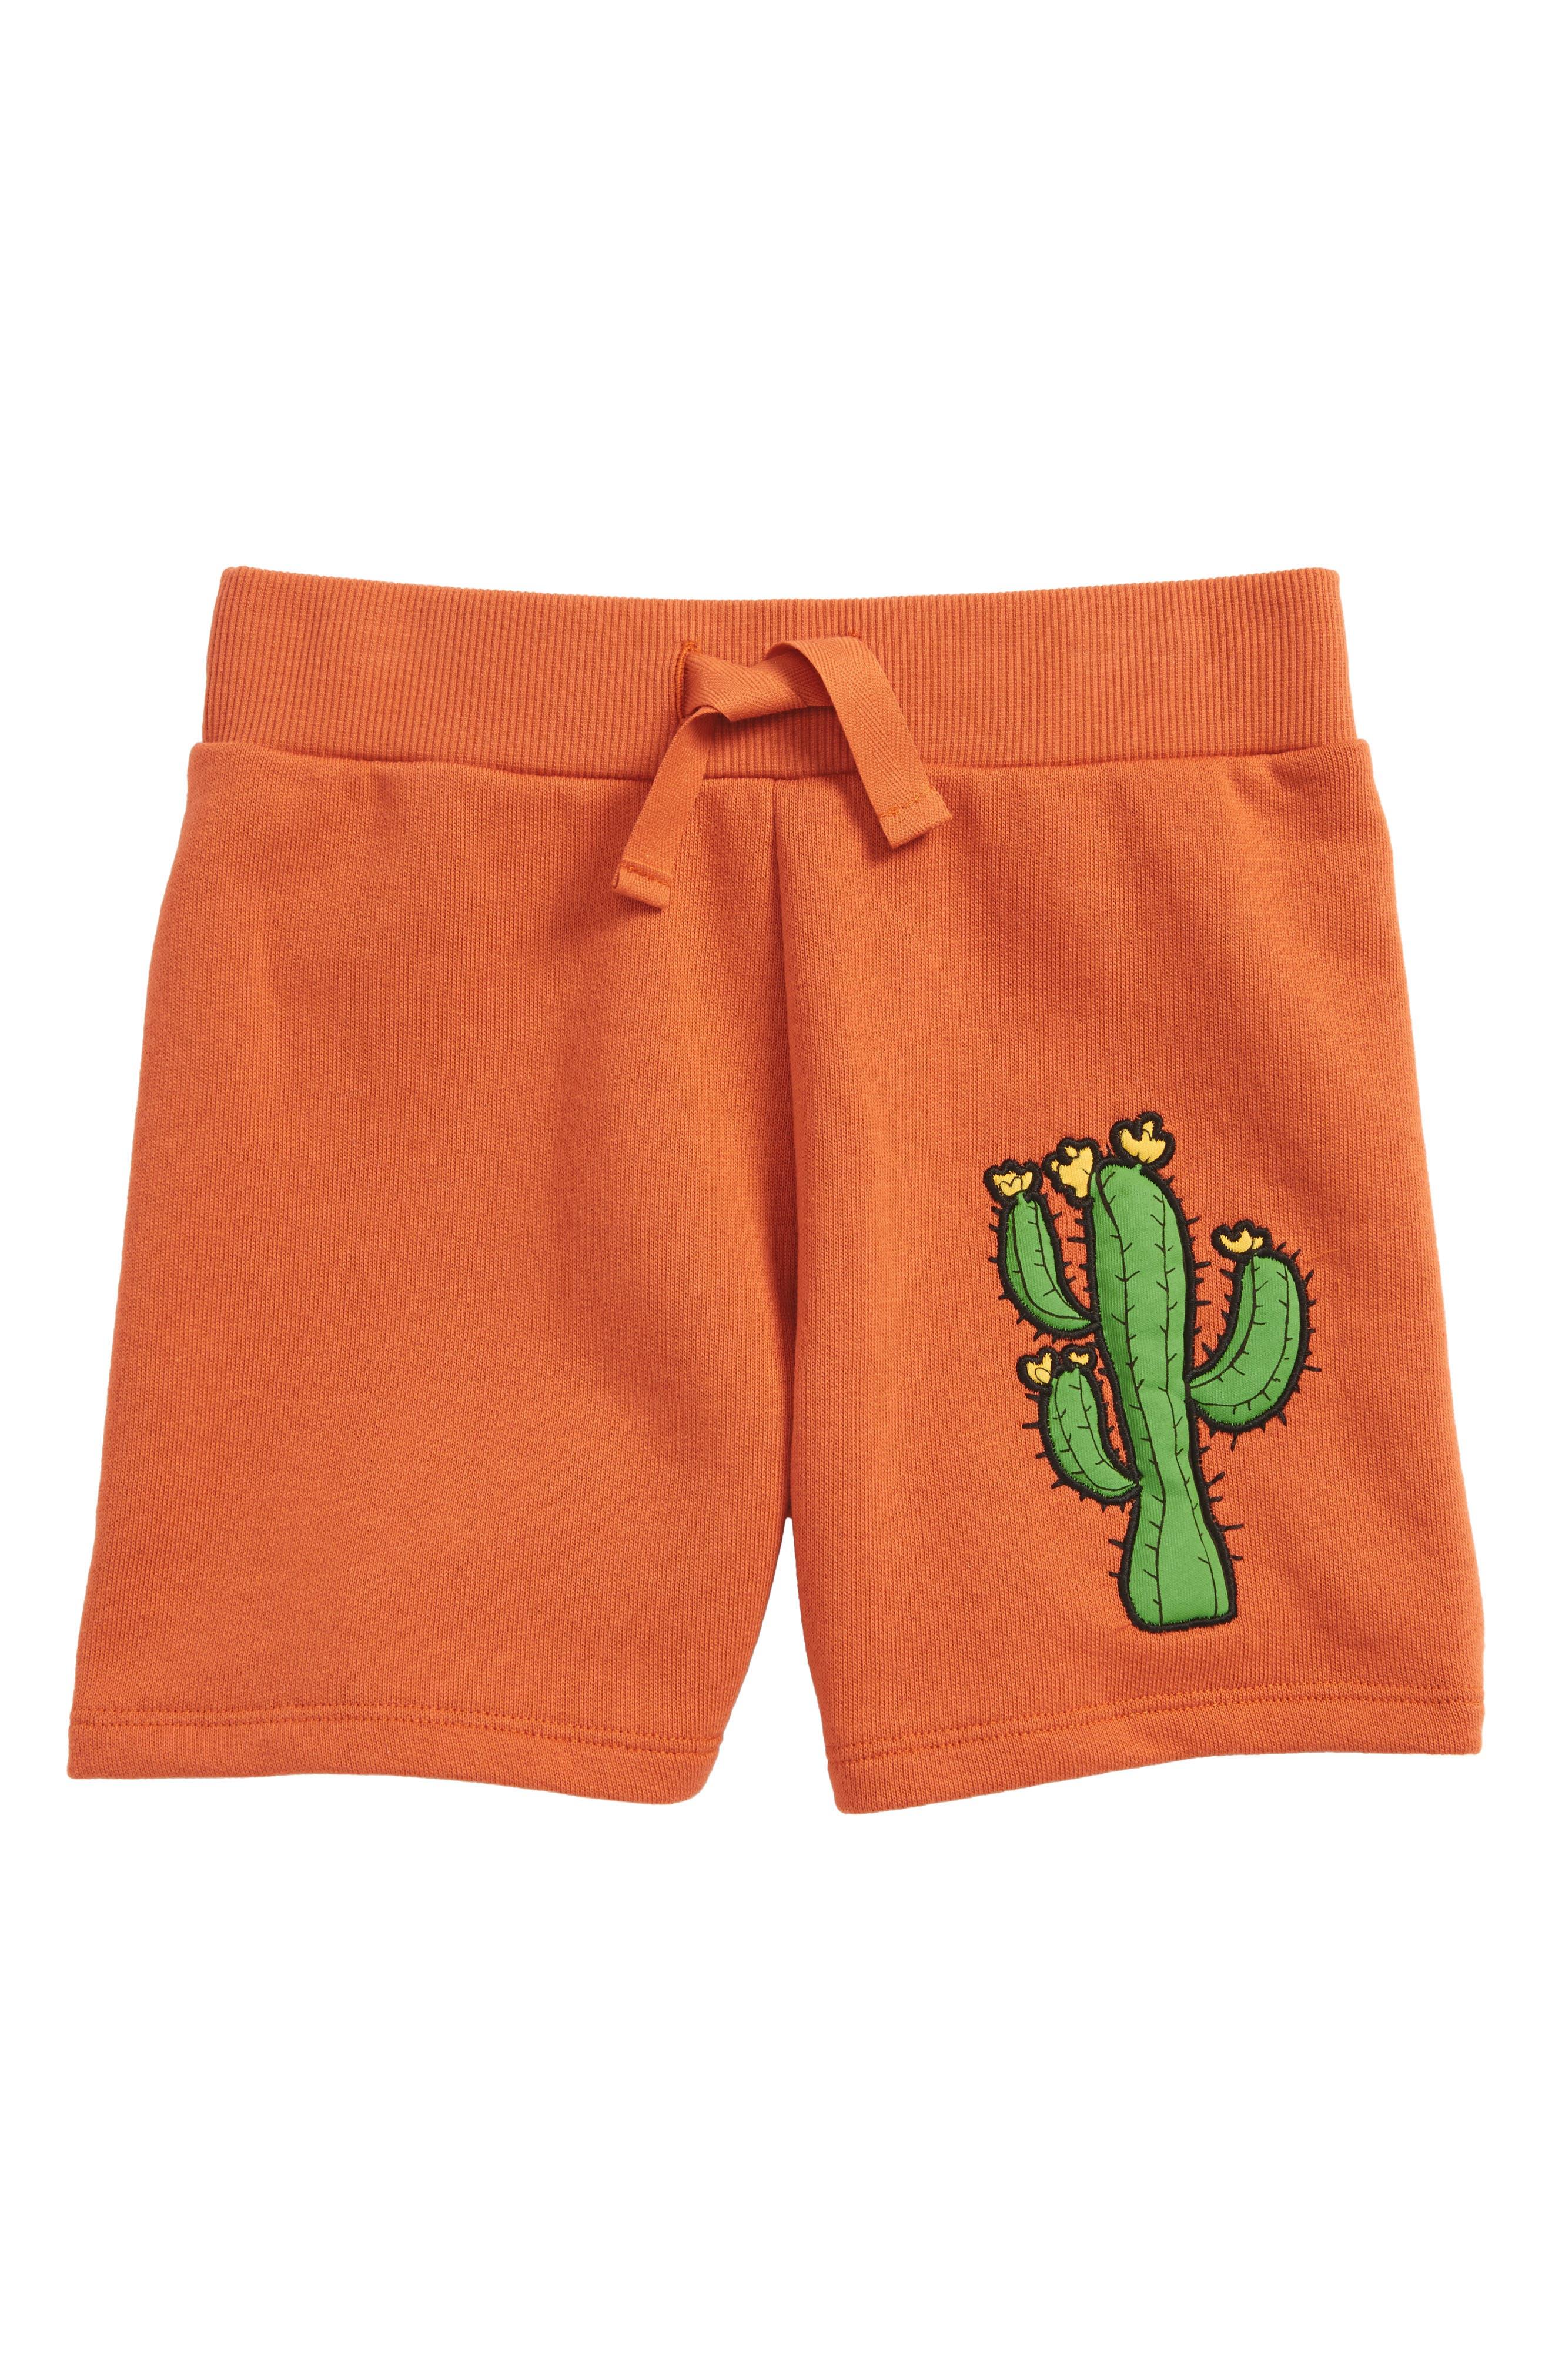 Donkey & Cactus Appliqué Organic Cotton Shorts,                             Main thumbnail 1, color,                             Orange